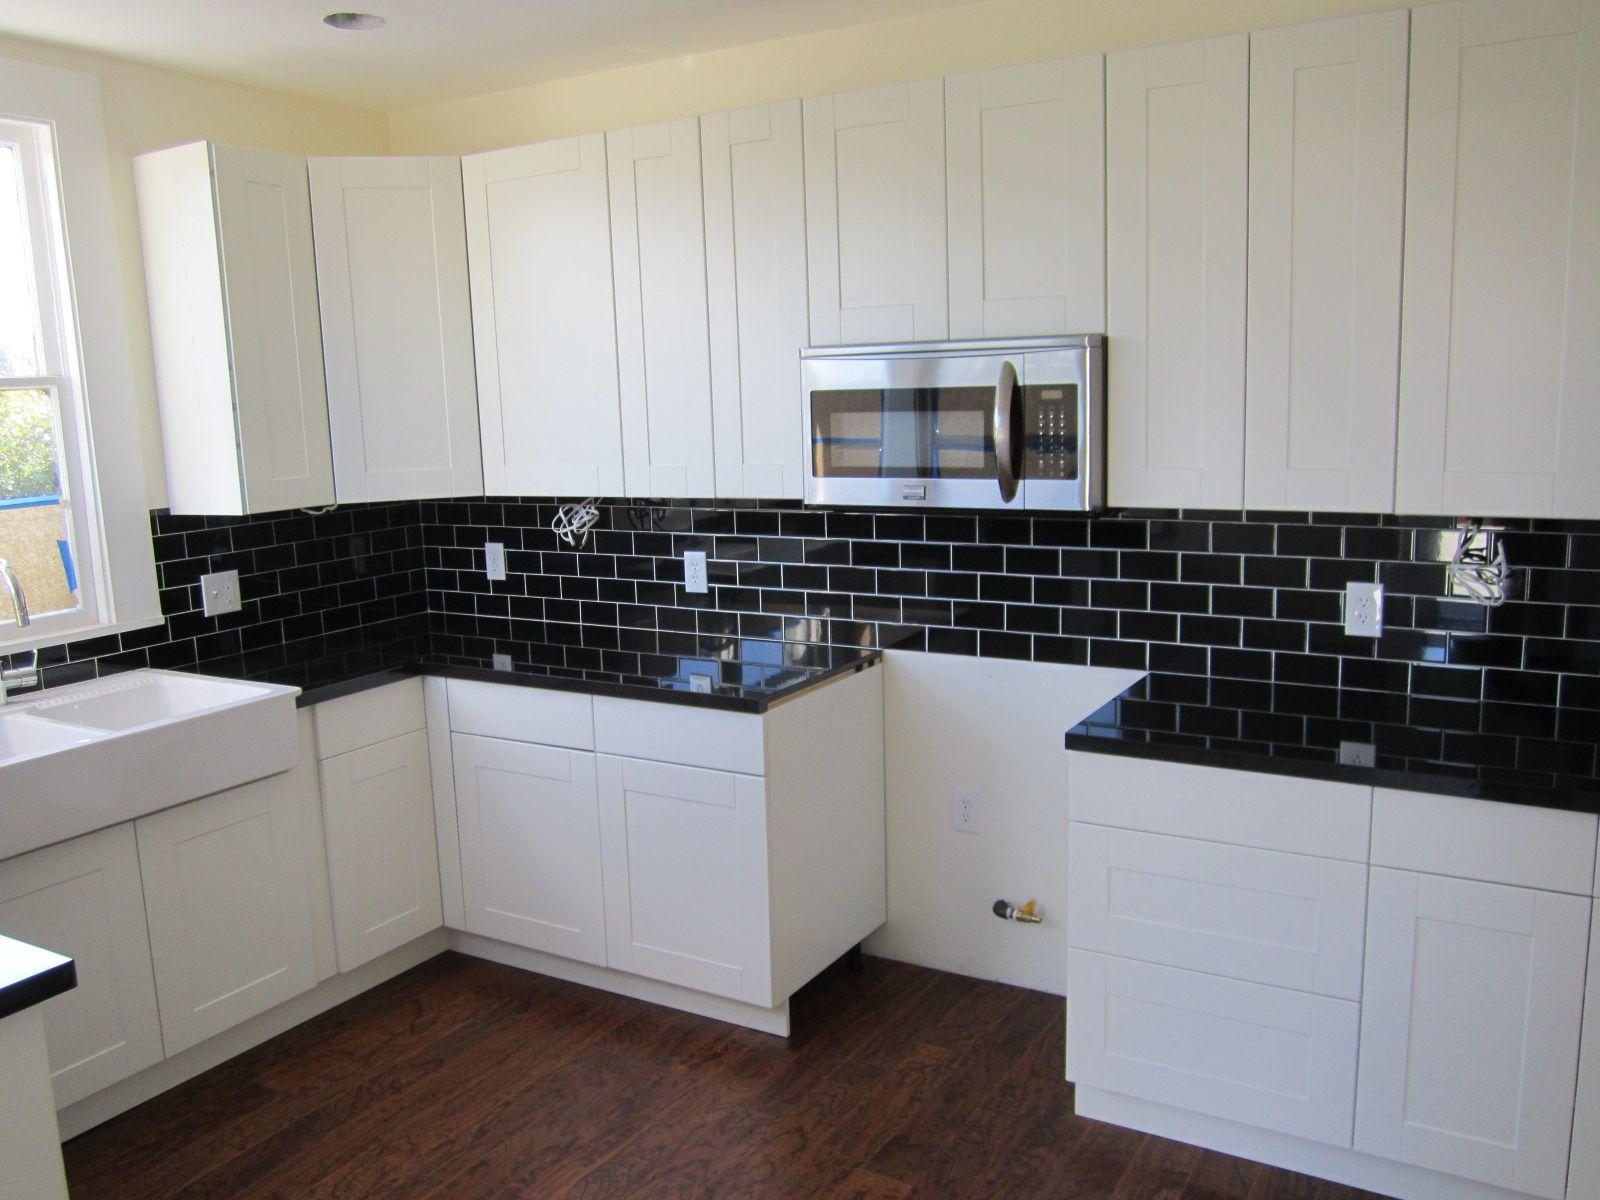 We Have Collected Some Really Great Black Subway Tiles Design To Give That Modern Touch To Y White Tile Kitchen Backsplash Black Backsplash Black Tiles Kitchen